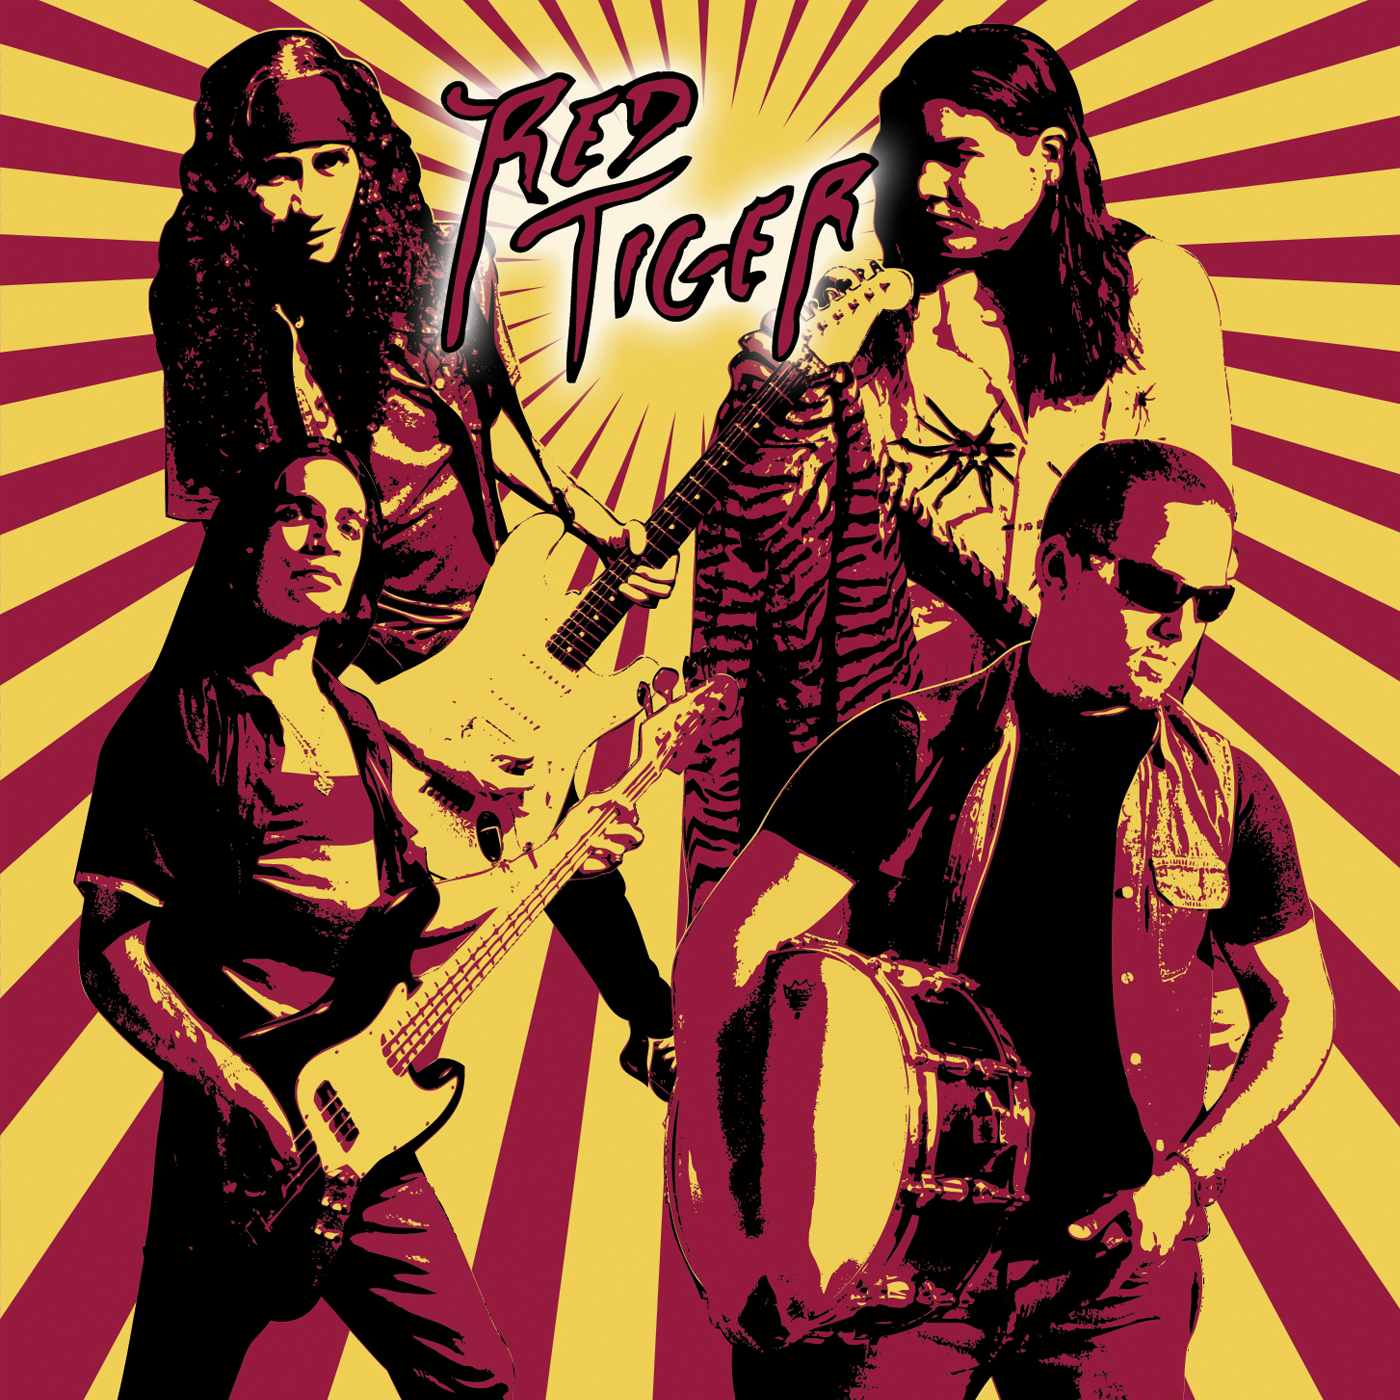 Red Tiger - 2010